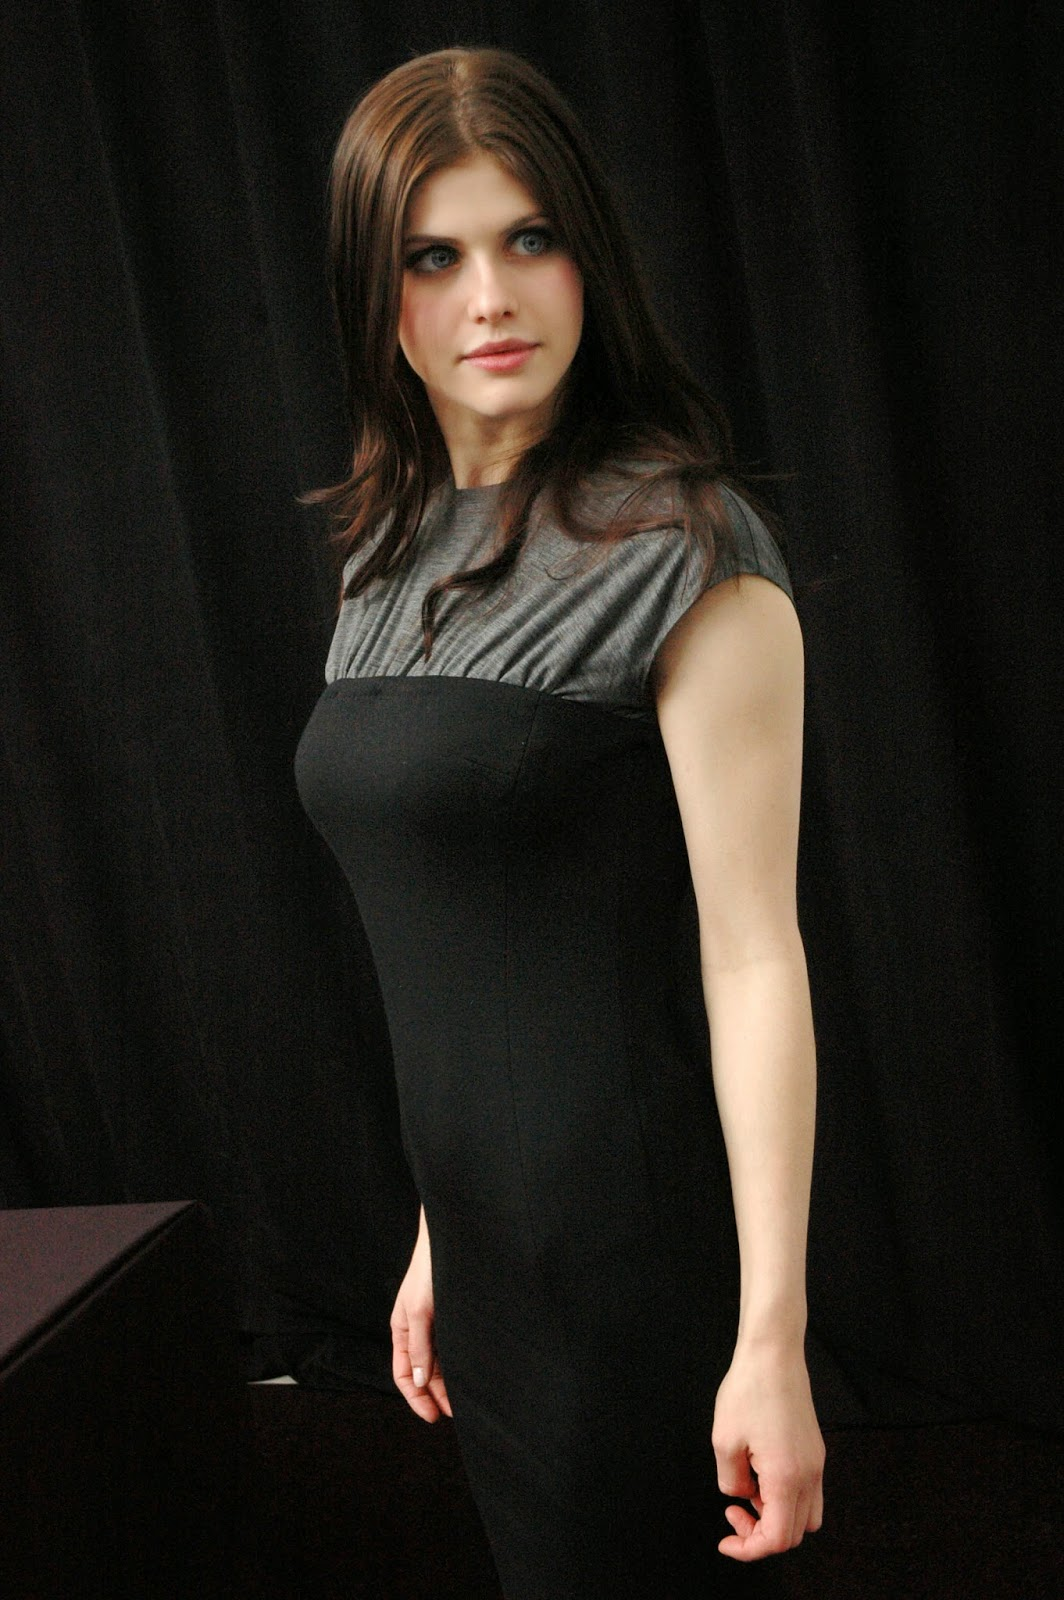 Alexandra Daddario is beautiful